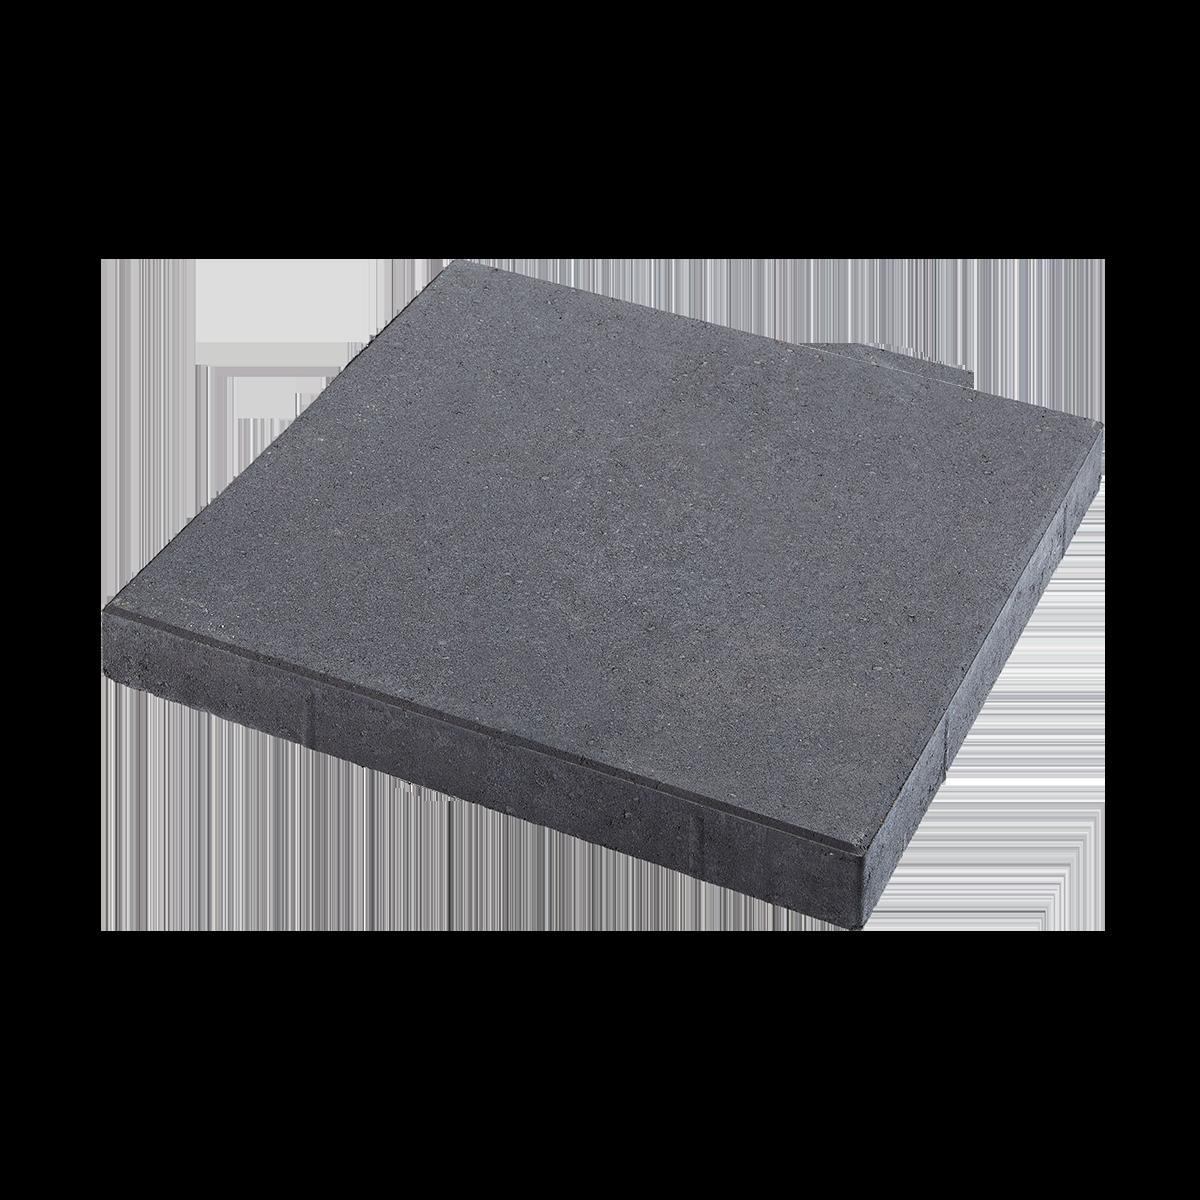 Fliser 60x60x8 cm Sort/Antracit